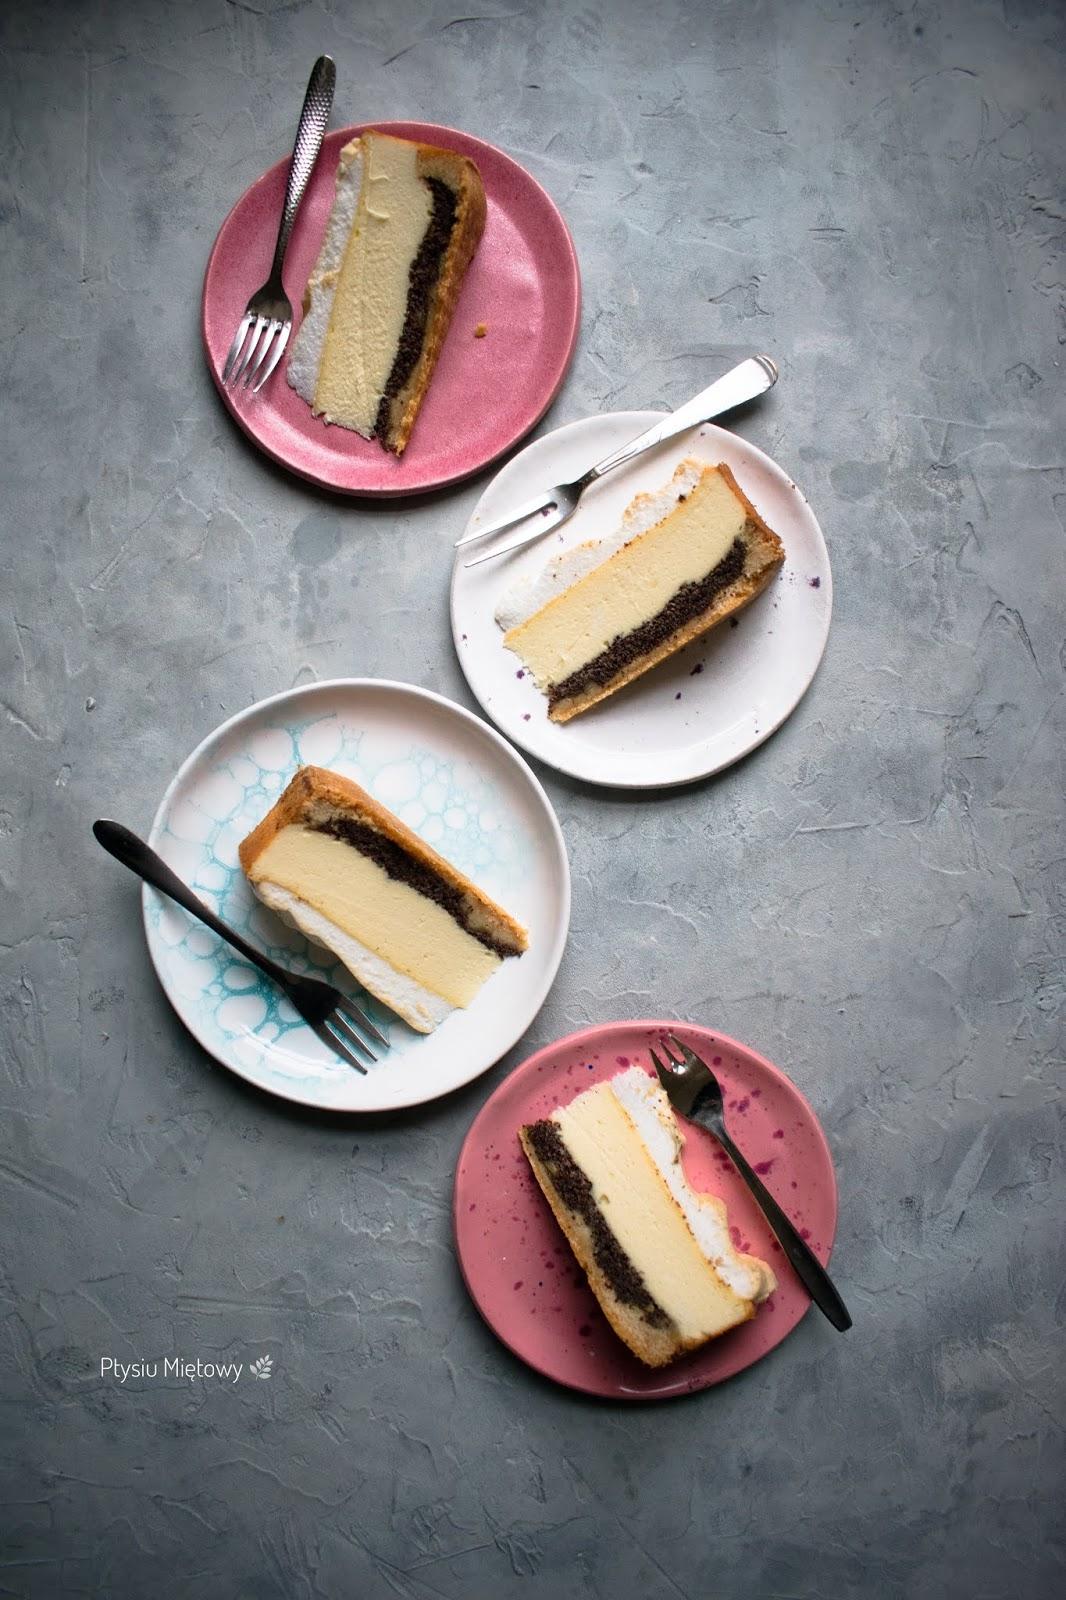 sernik, deser, ciasto, ptysiu mietowy